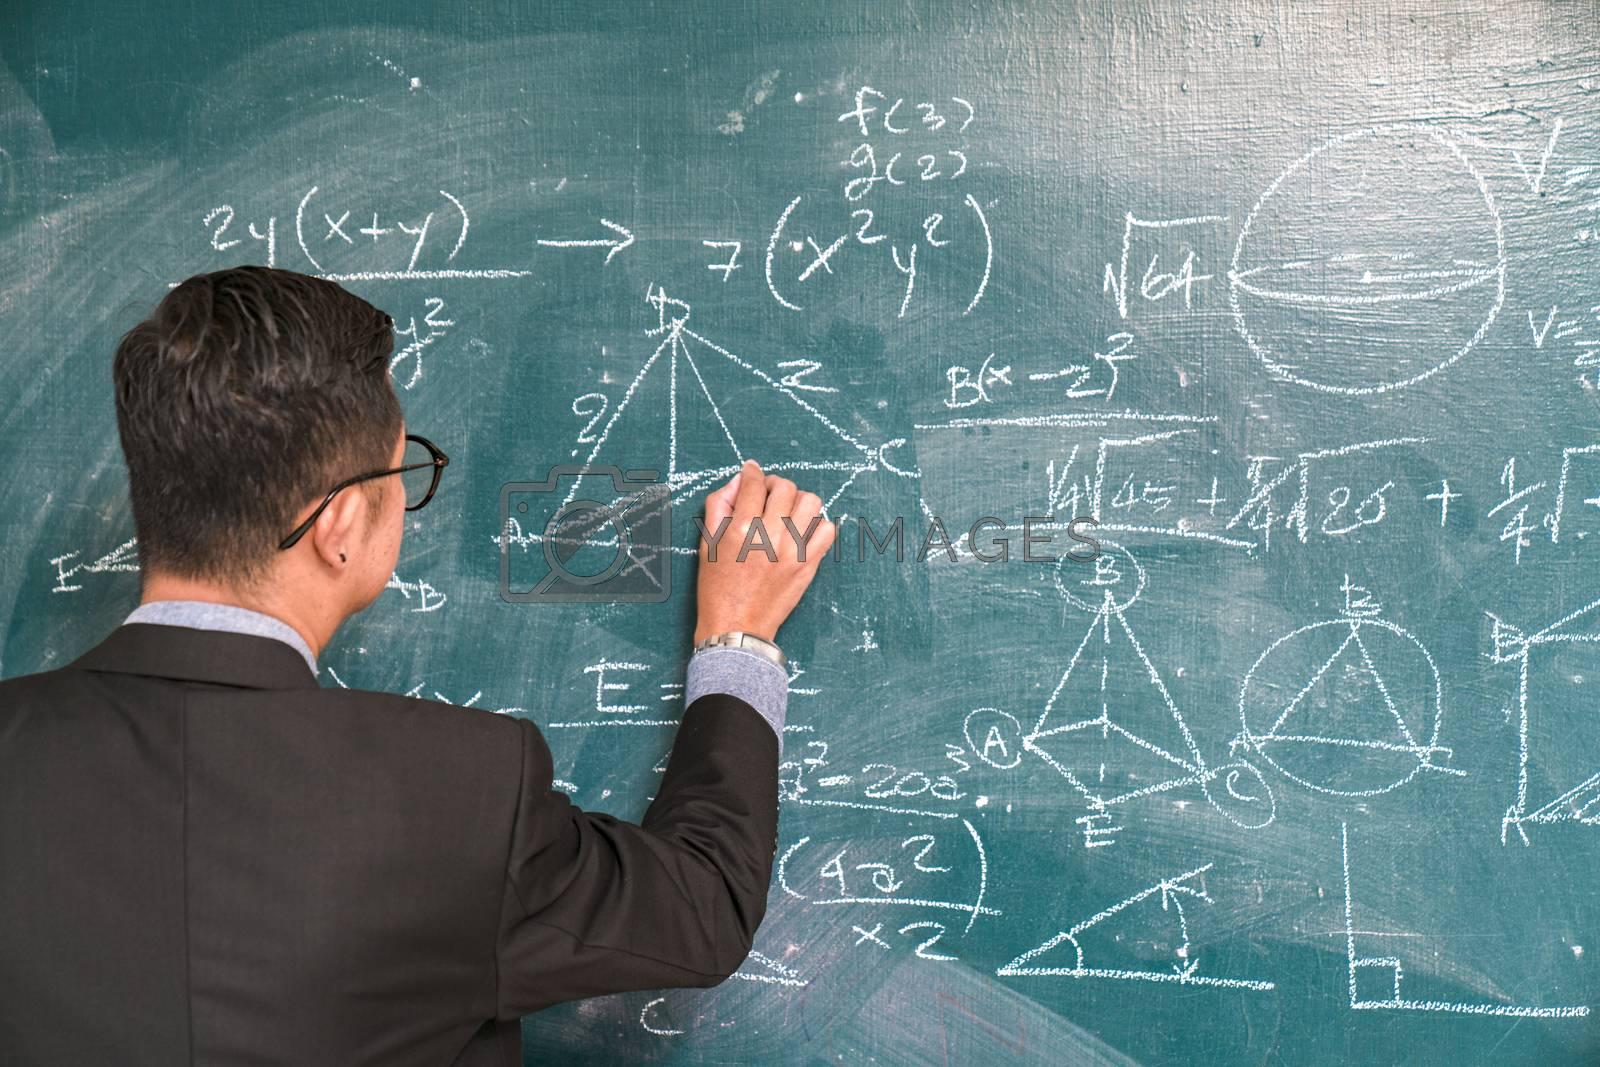 The science professor writes on the board while having a blackboard and a blackboard.